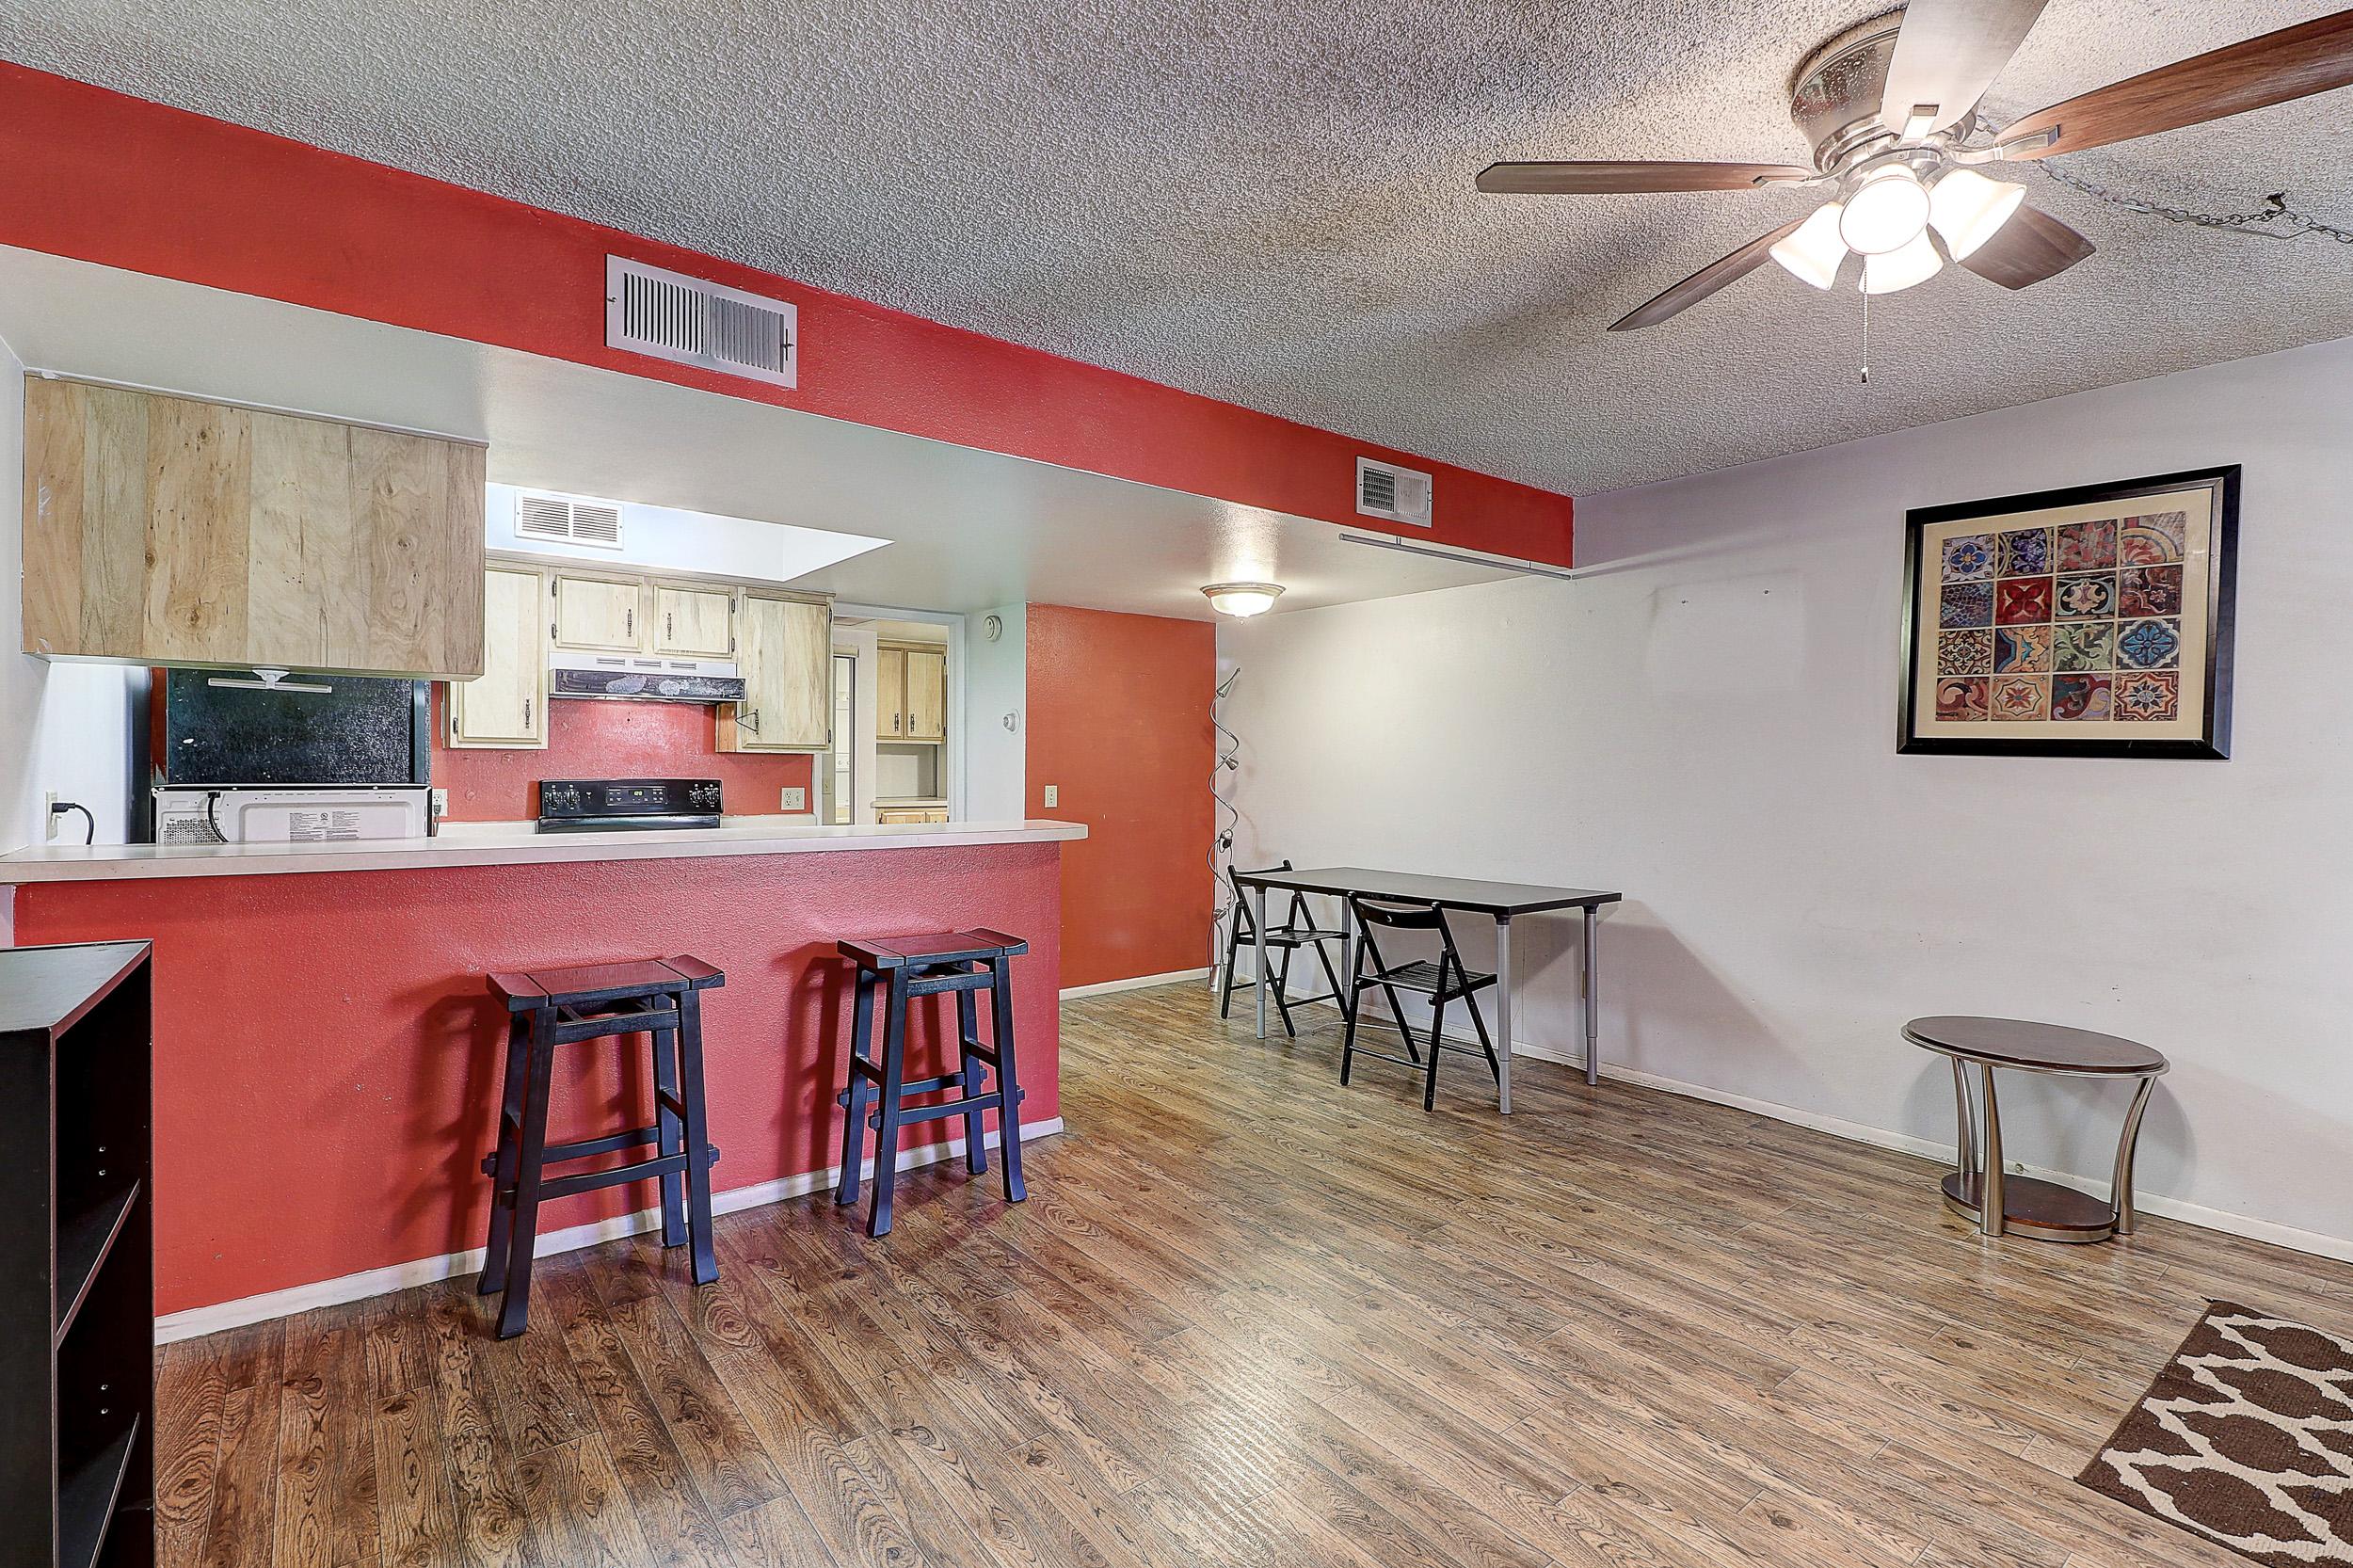 8847 N 8TH ST 207, Phoenix, AZ 85020